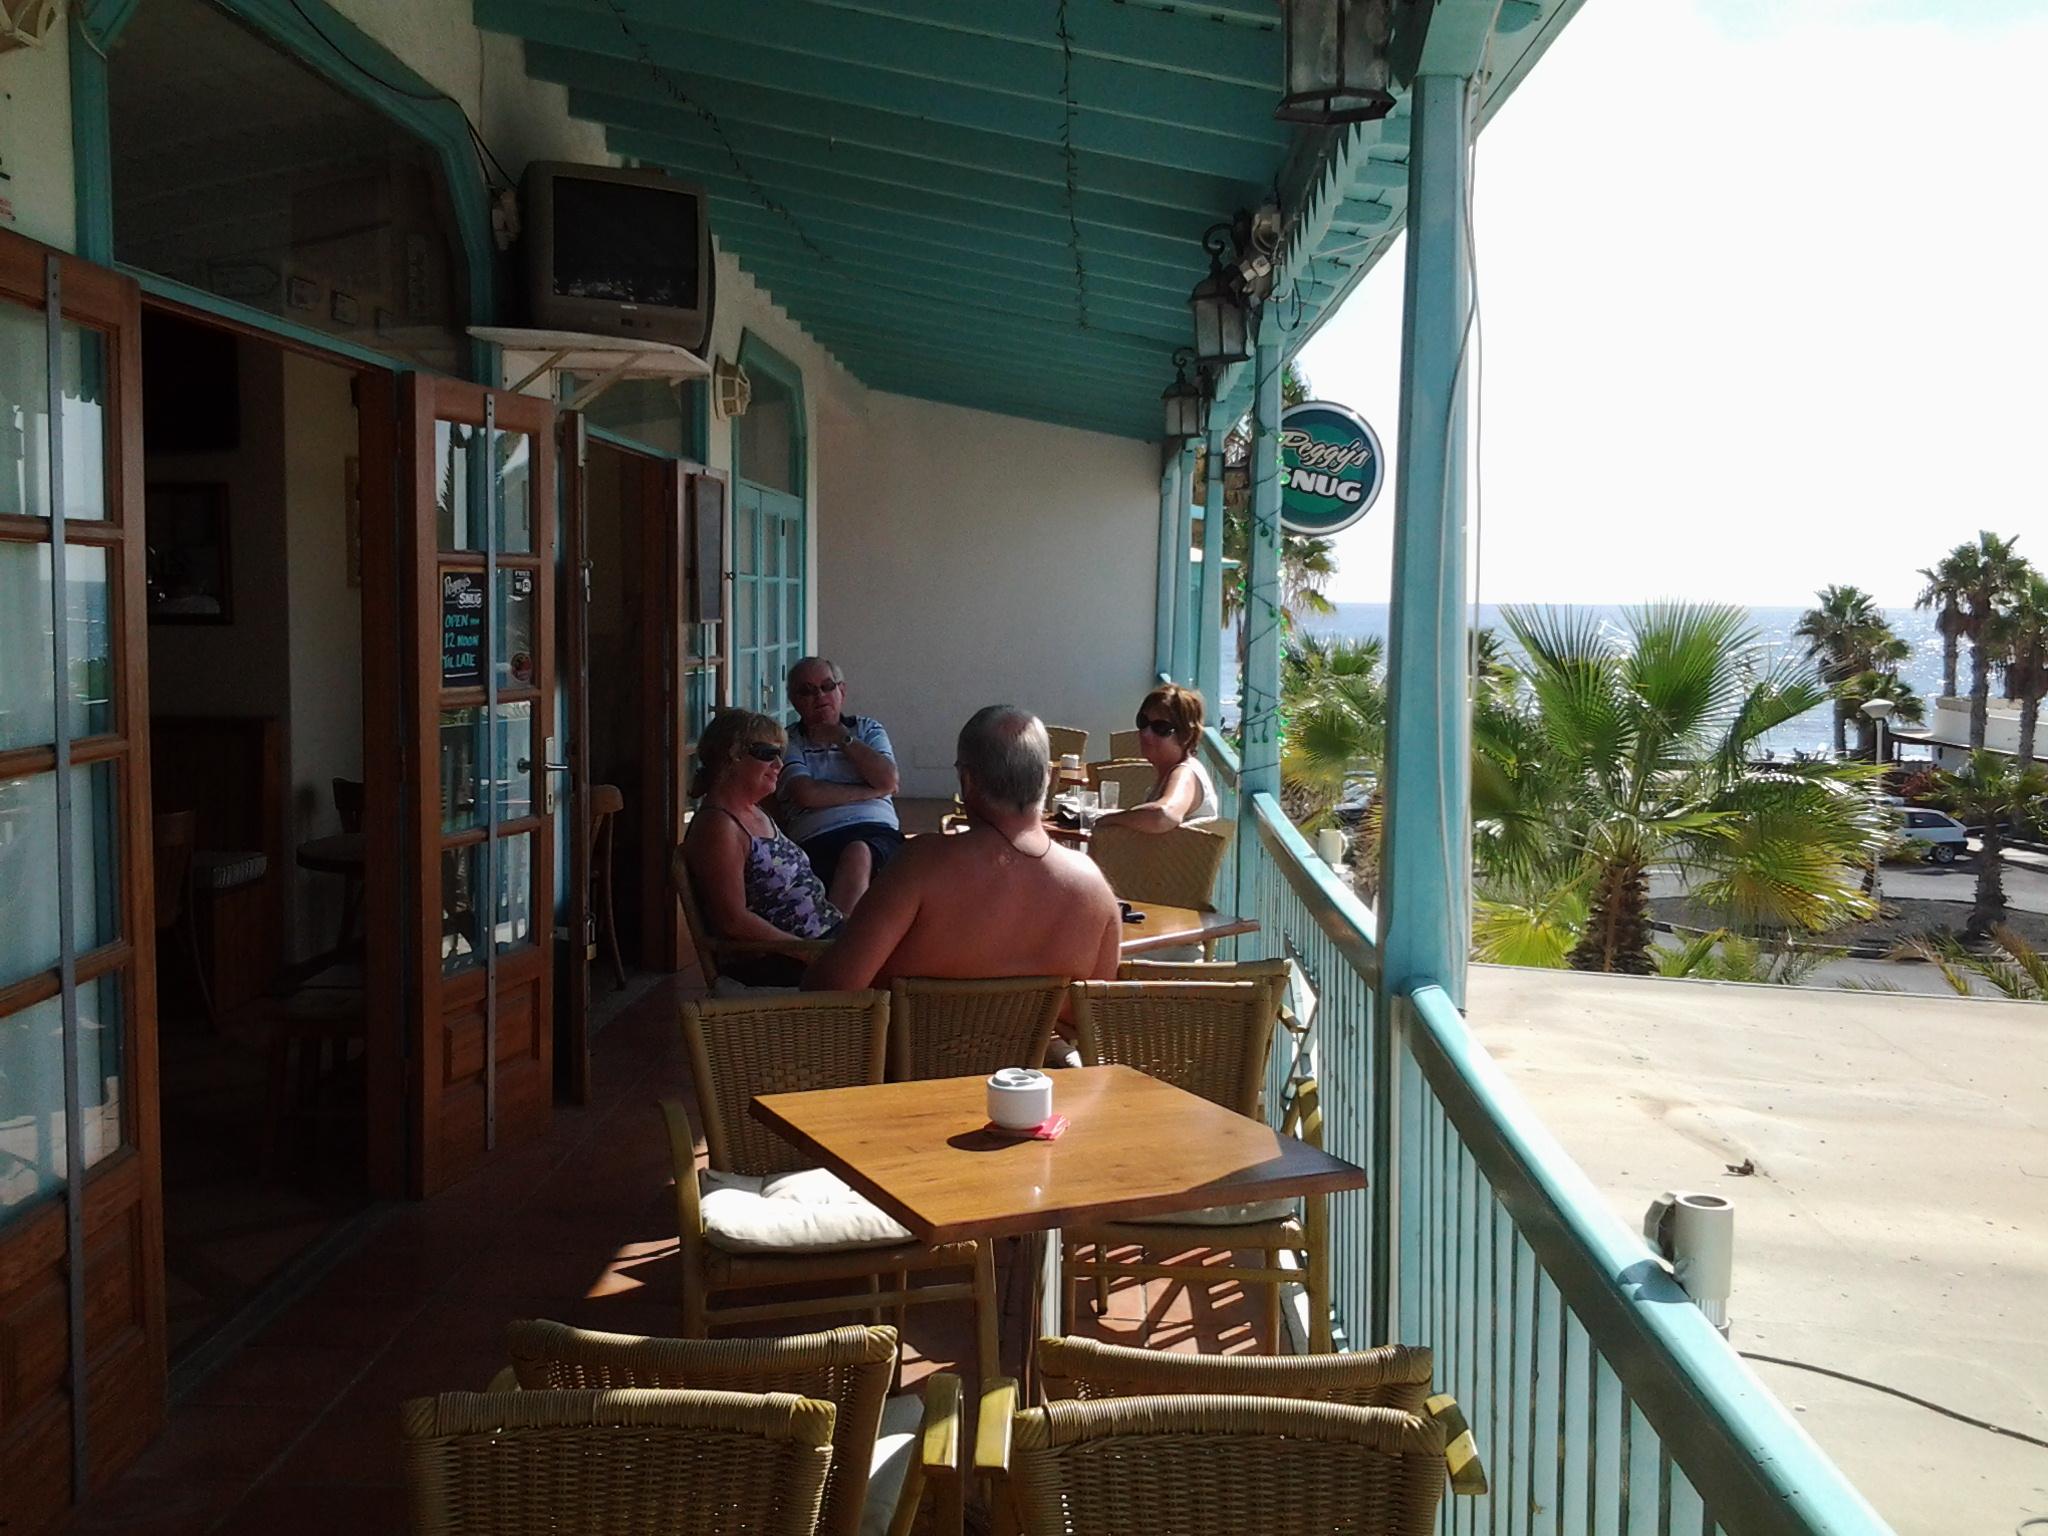 Hotel beatriz playa and spa matagorda beatriz playa and spa - Peggy S Snug